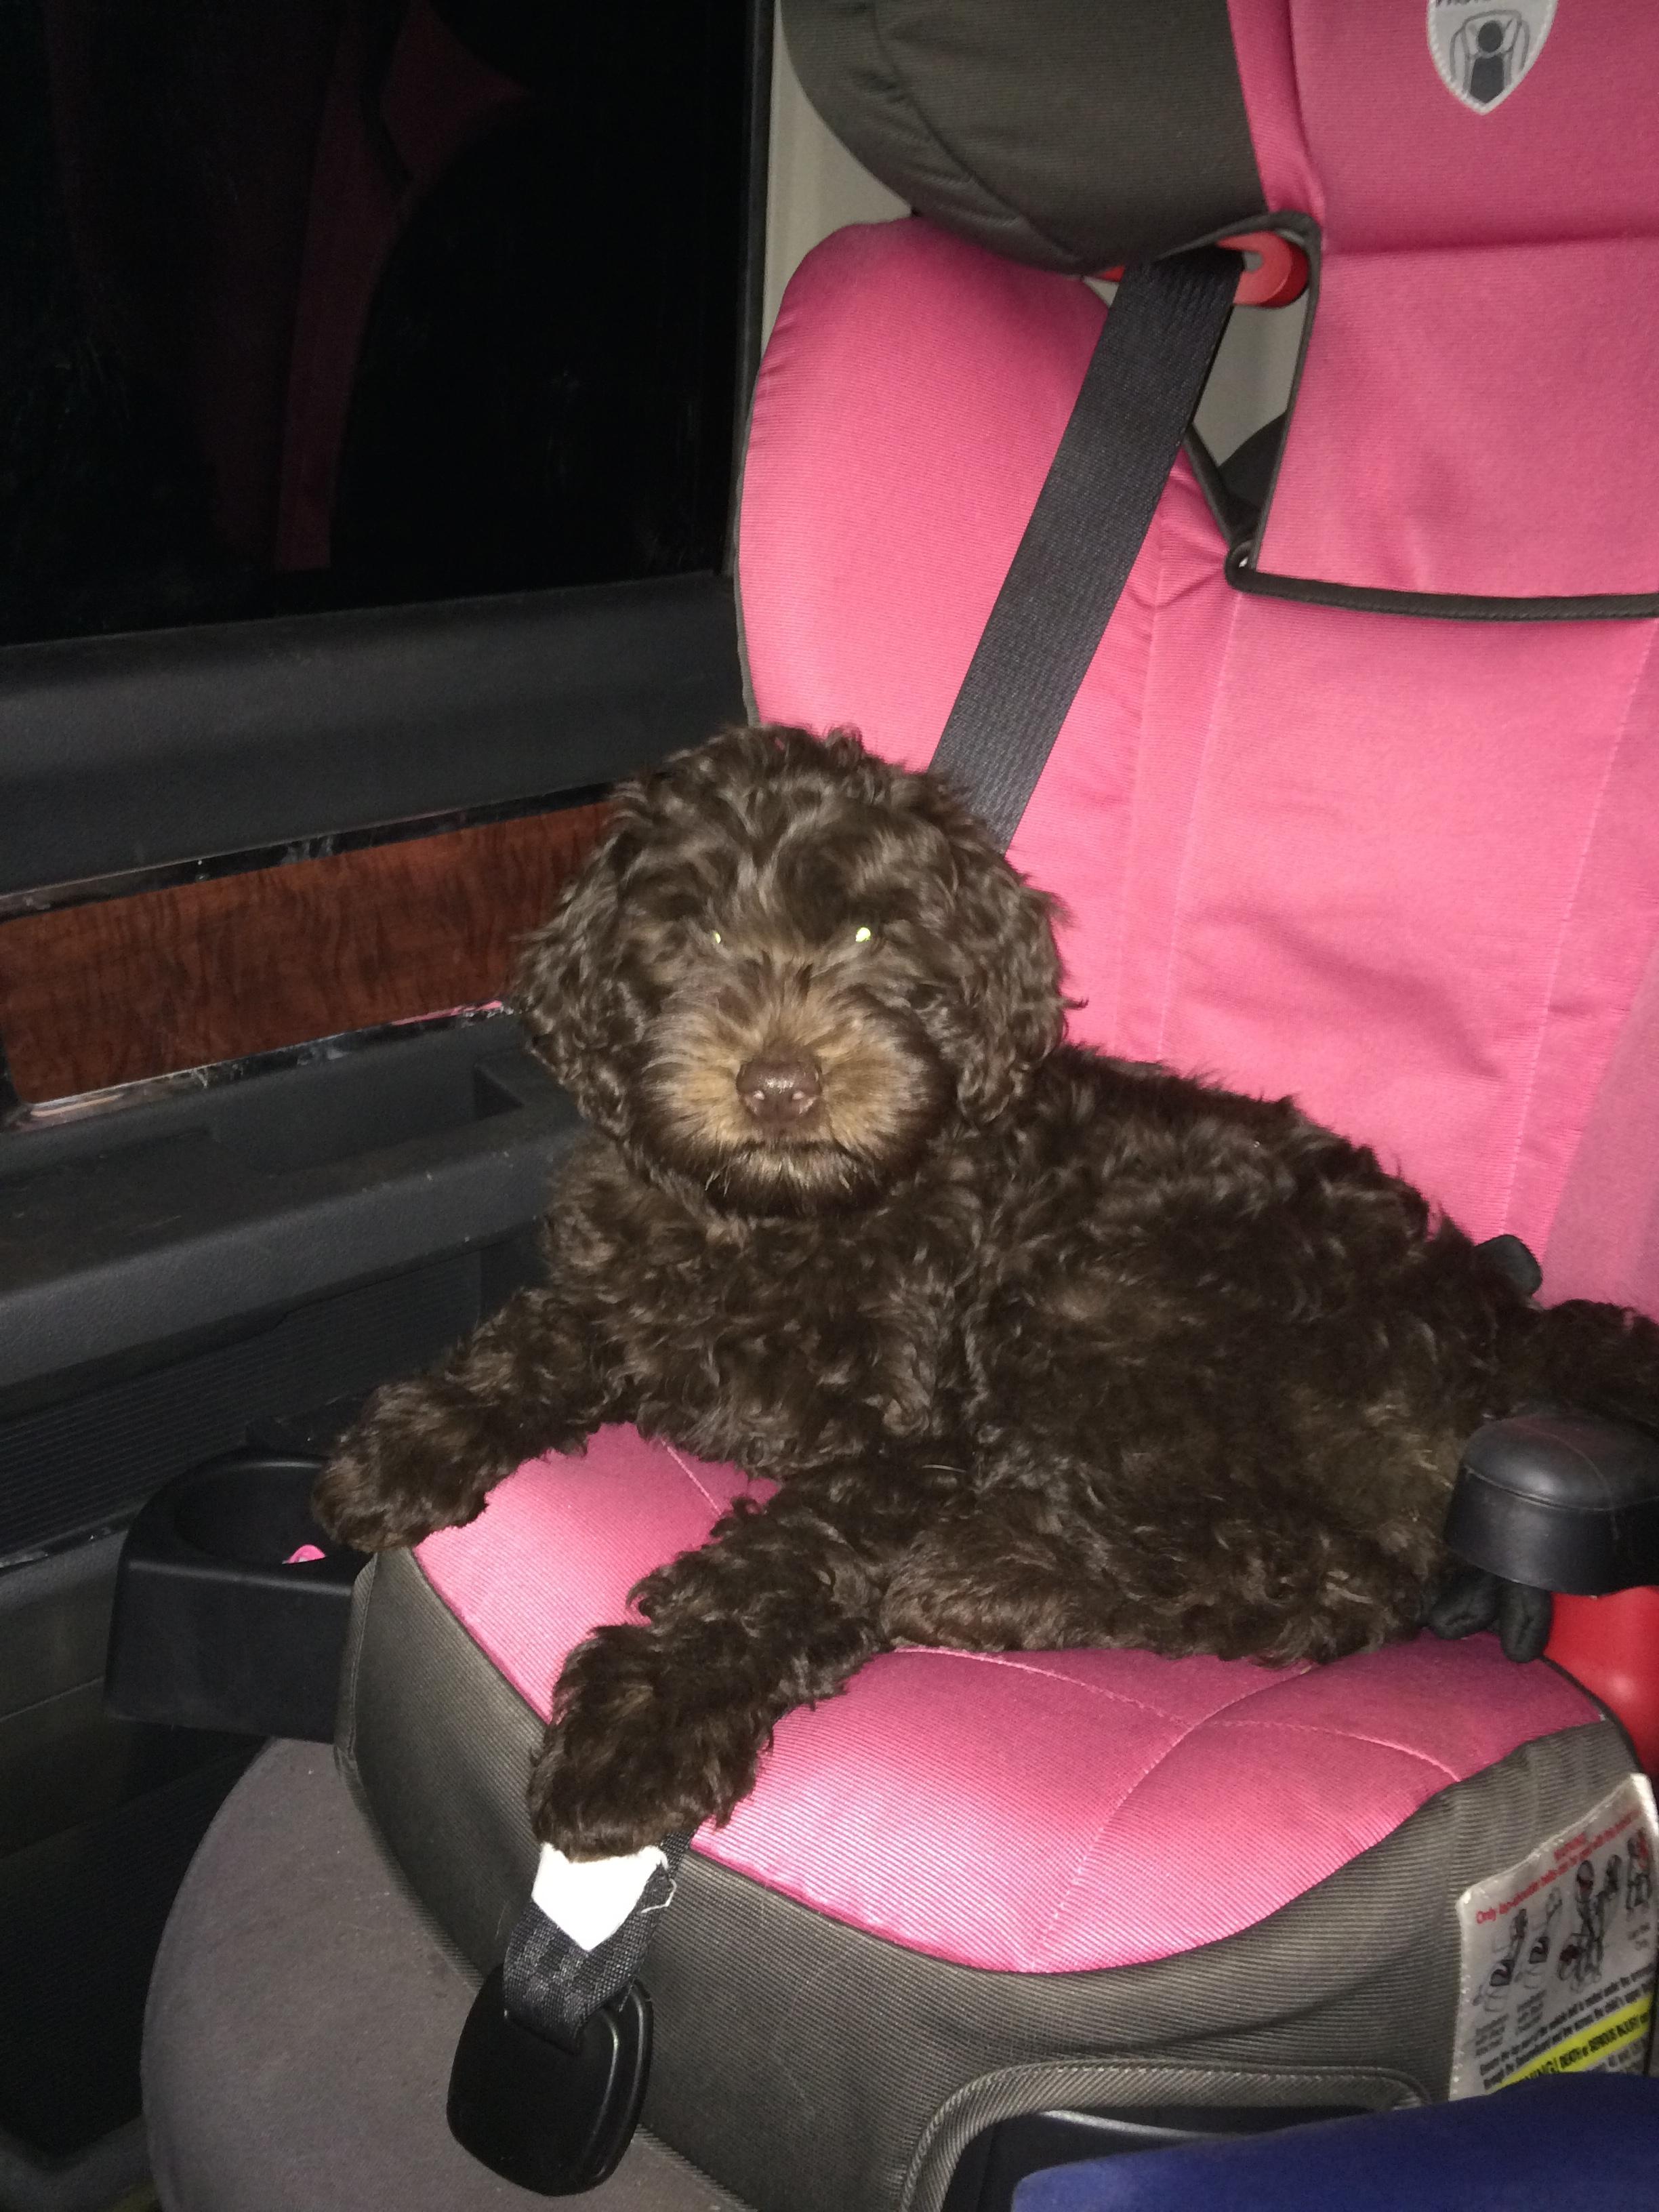 River - Keeping Emma's car seat warm